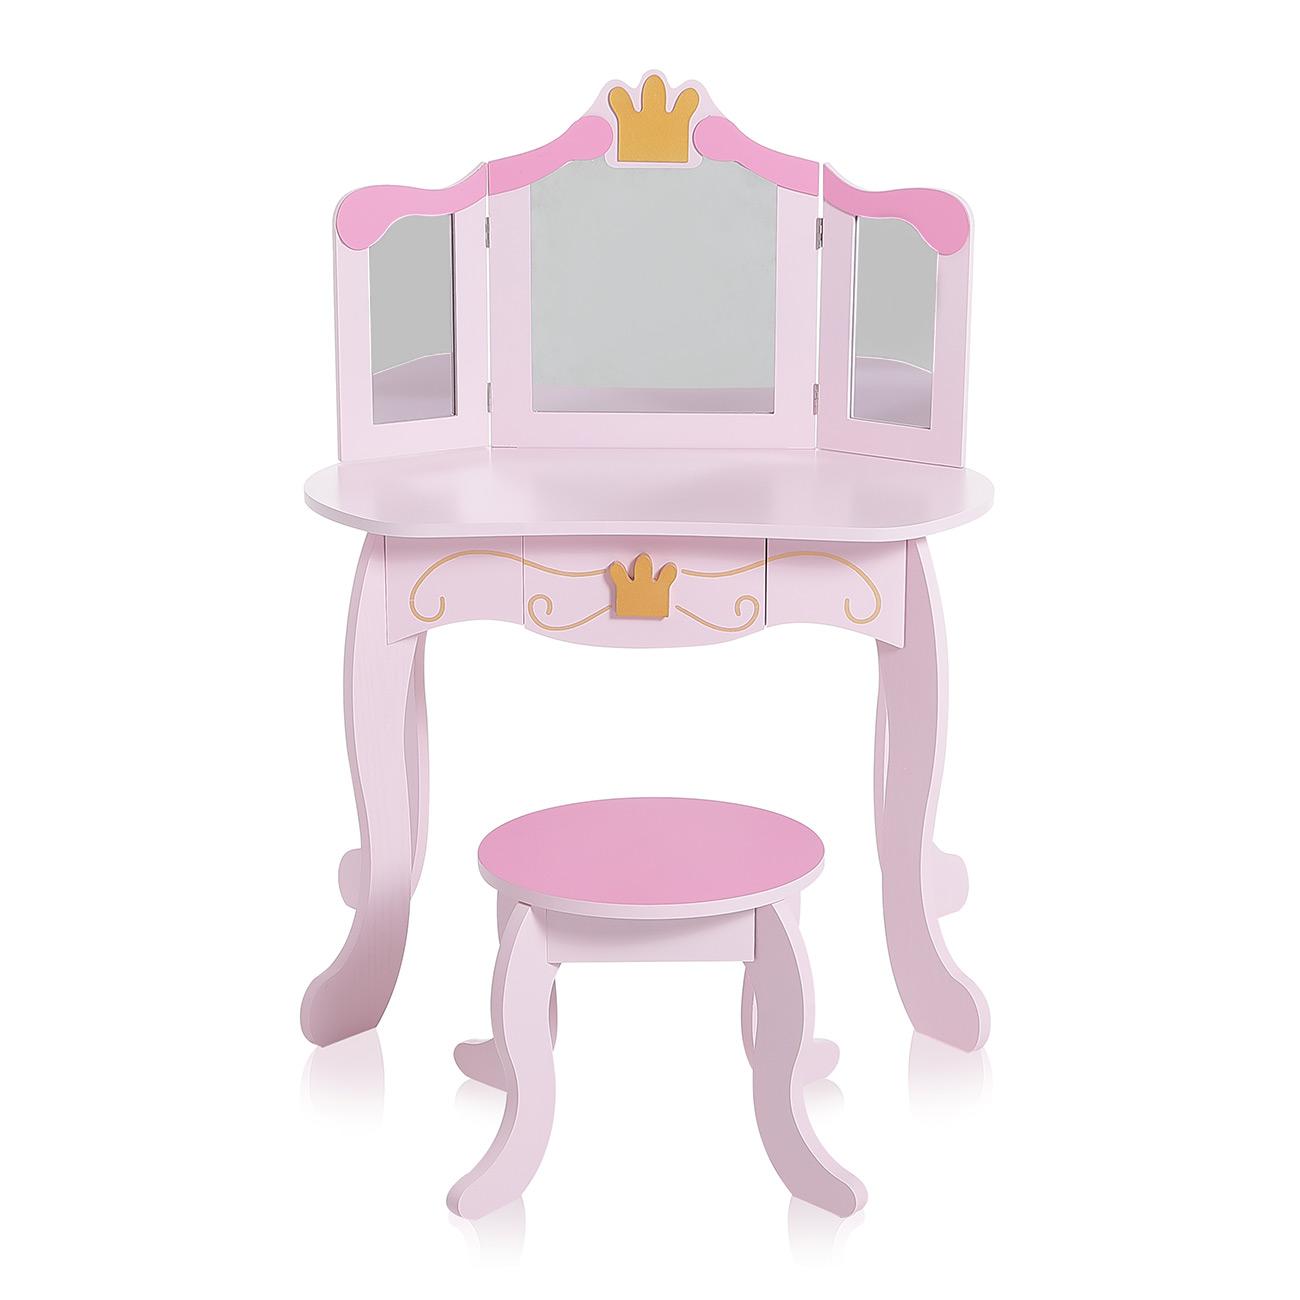 enfant coiffeuse table de maquillage miroir vanit meuble tabouret baby vivo ebay. Black Bedroom Furniture Sets. Home Design Ideas